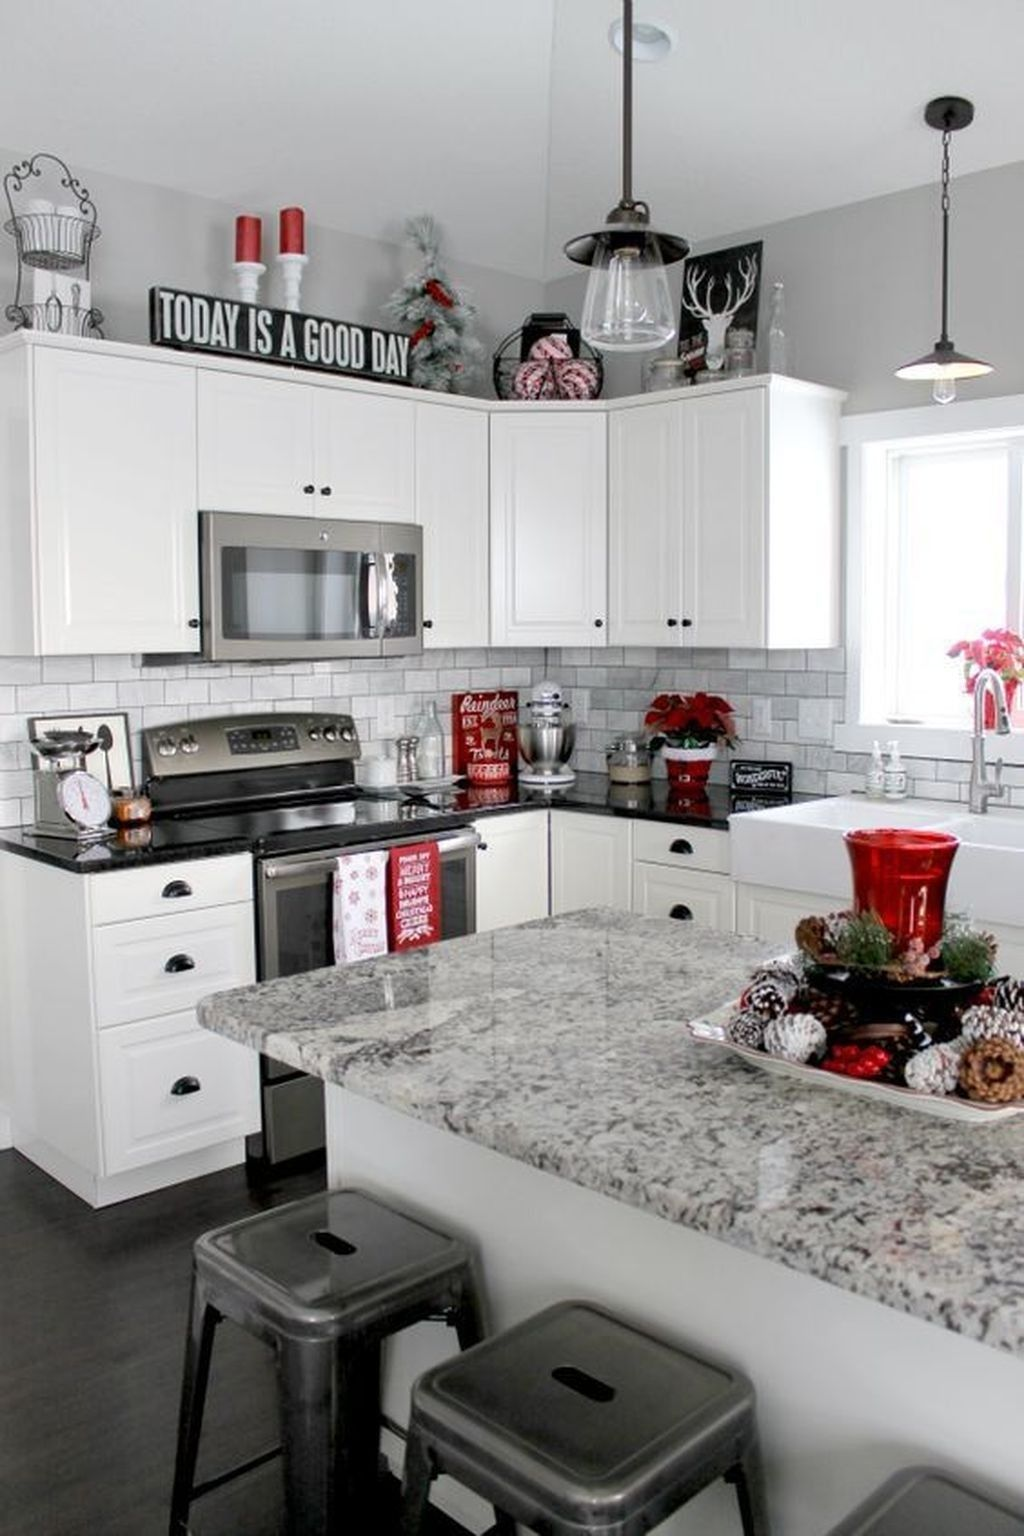 Cheap Classroom Decor Saleprice 37 Christmas Kitchen Decor White Kitchen Decor Black White Kitchen Decor